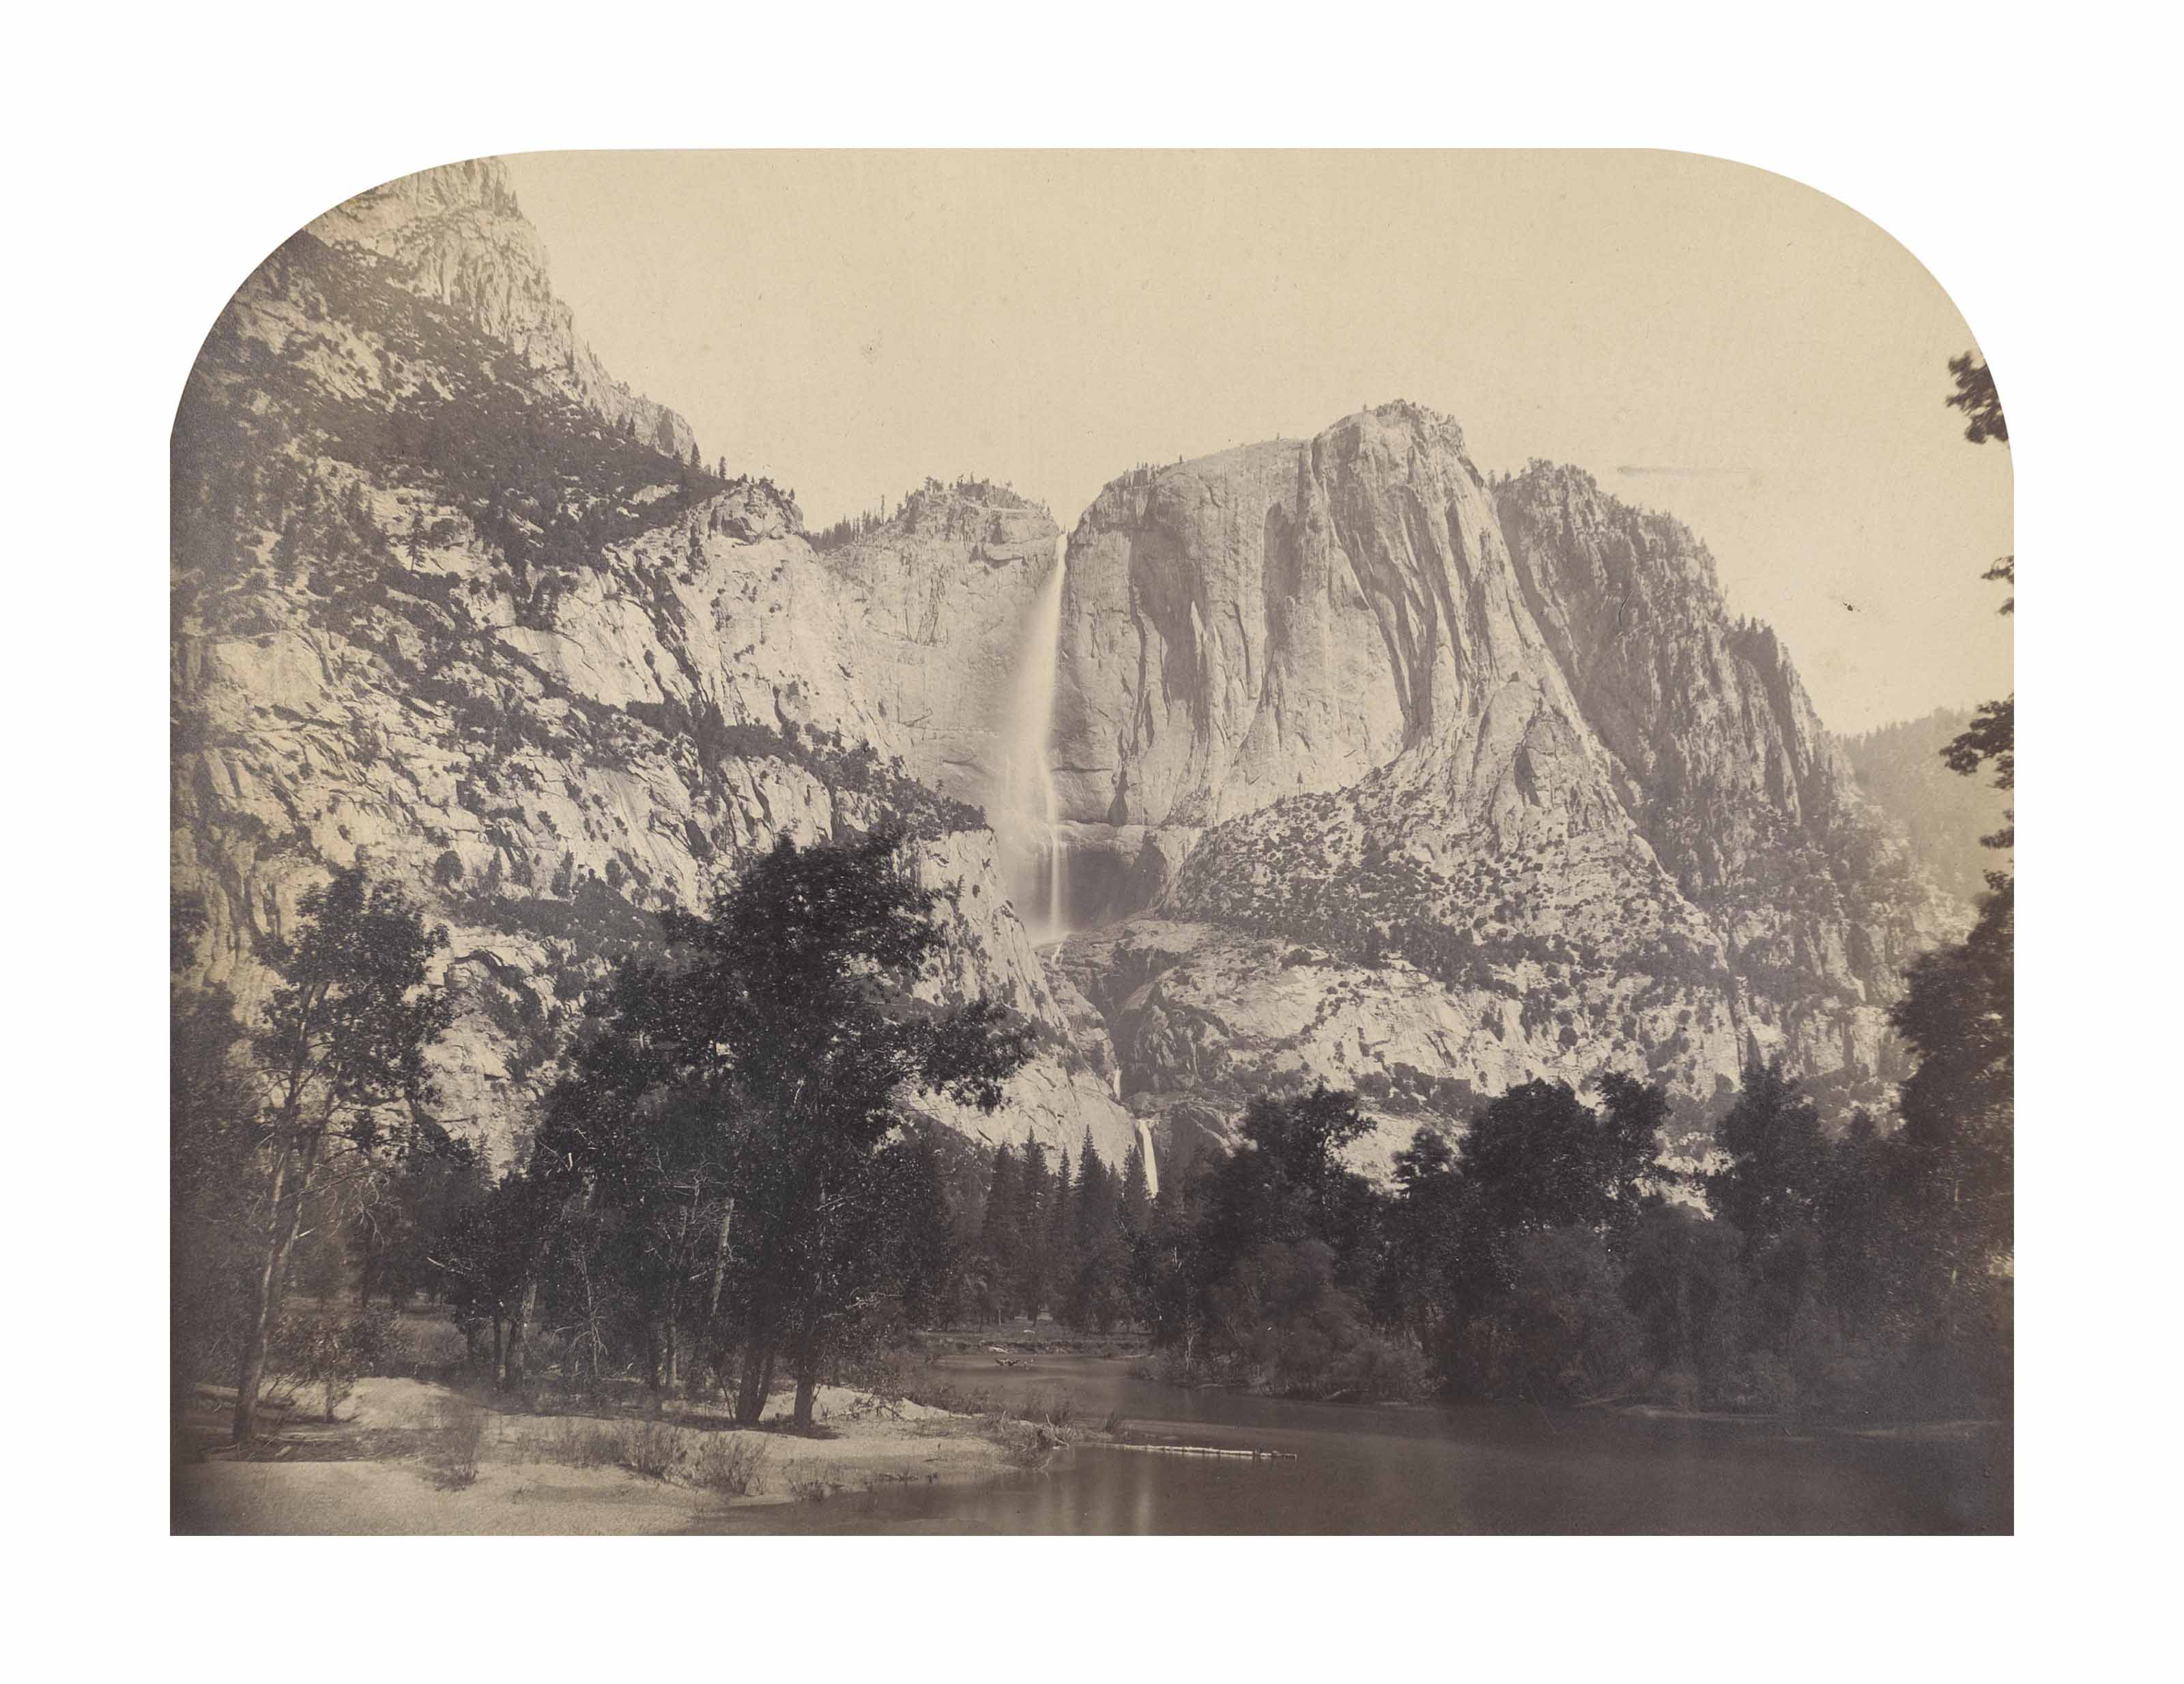 Horsetail Fall, Yosemite, 1861